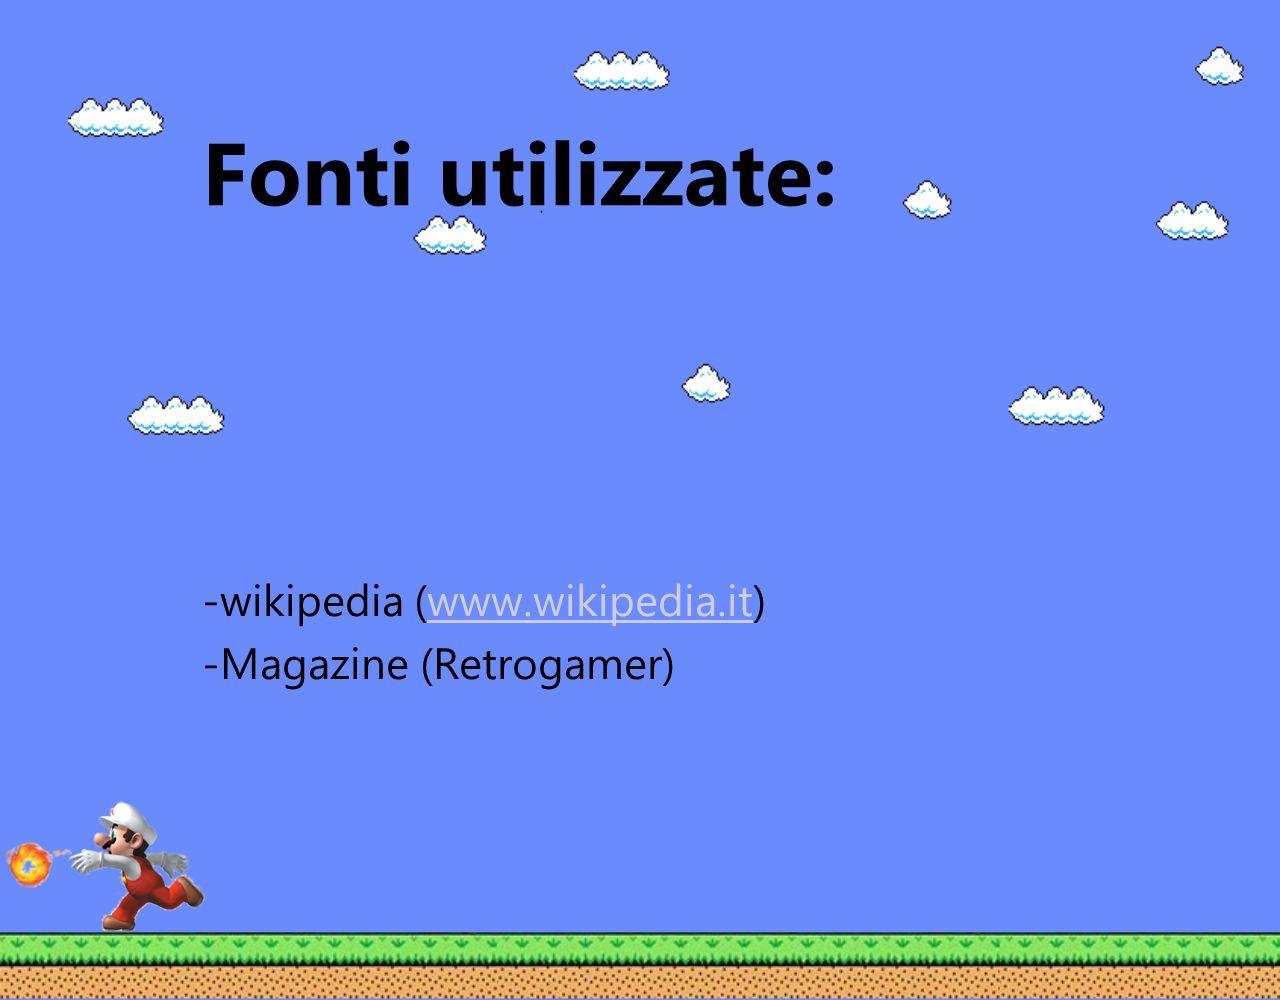 Fonti utilizzate: -wikipedia (www.wikipedia.it)www.wikipedia.it -Magazine (Retrogamer)